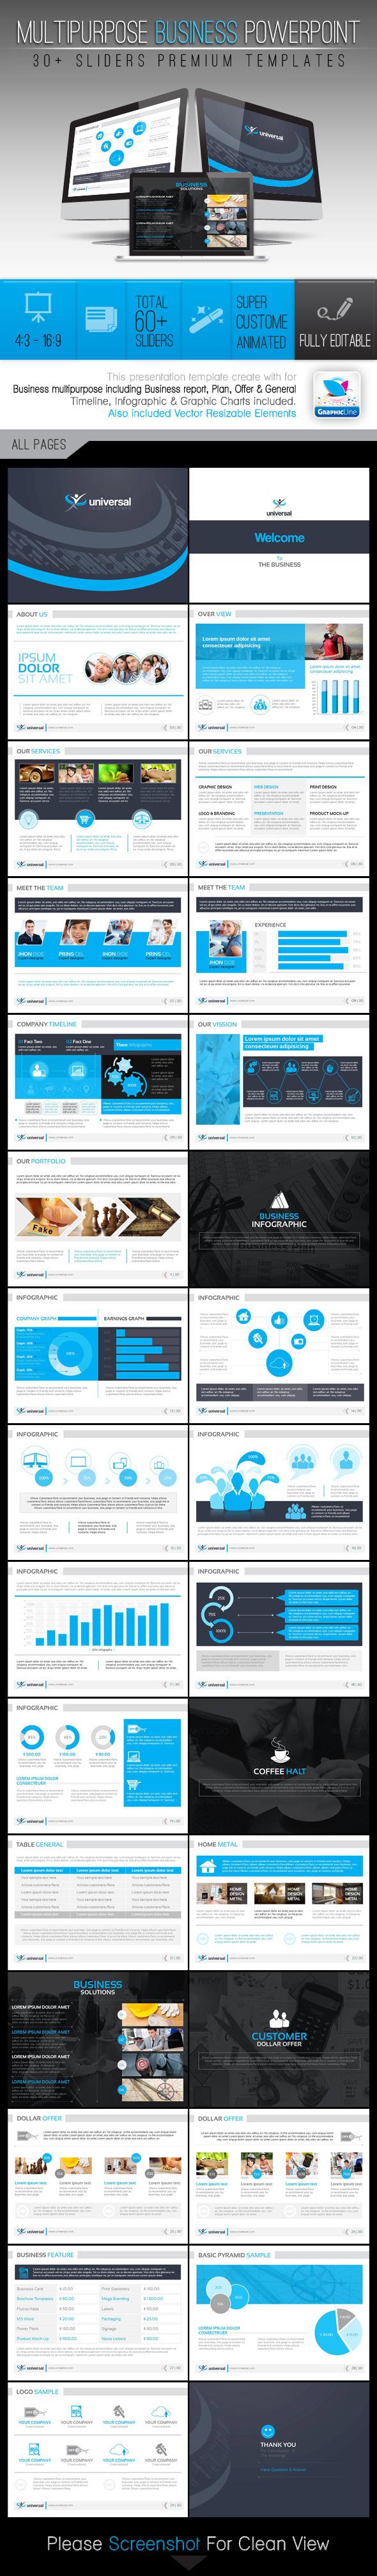 Universal_Multipurpose Business Templates